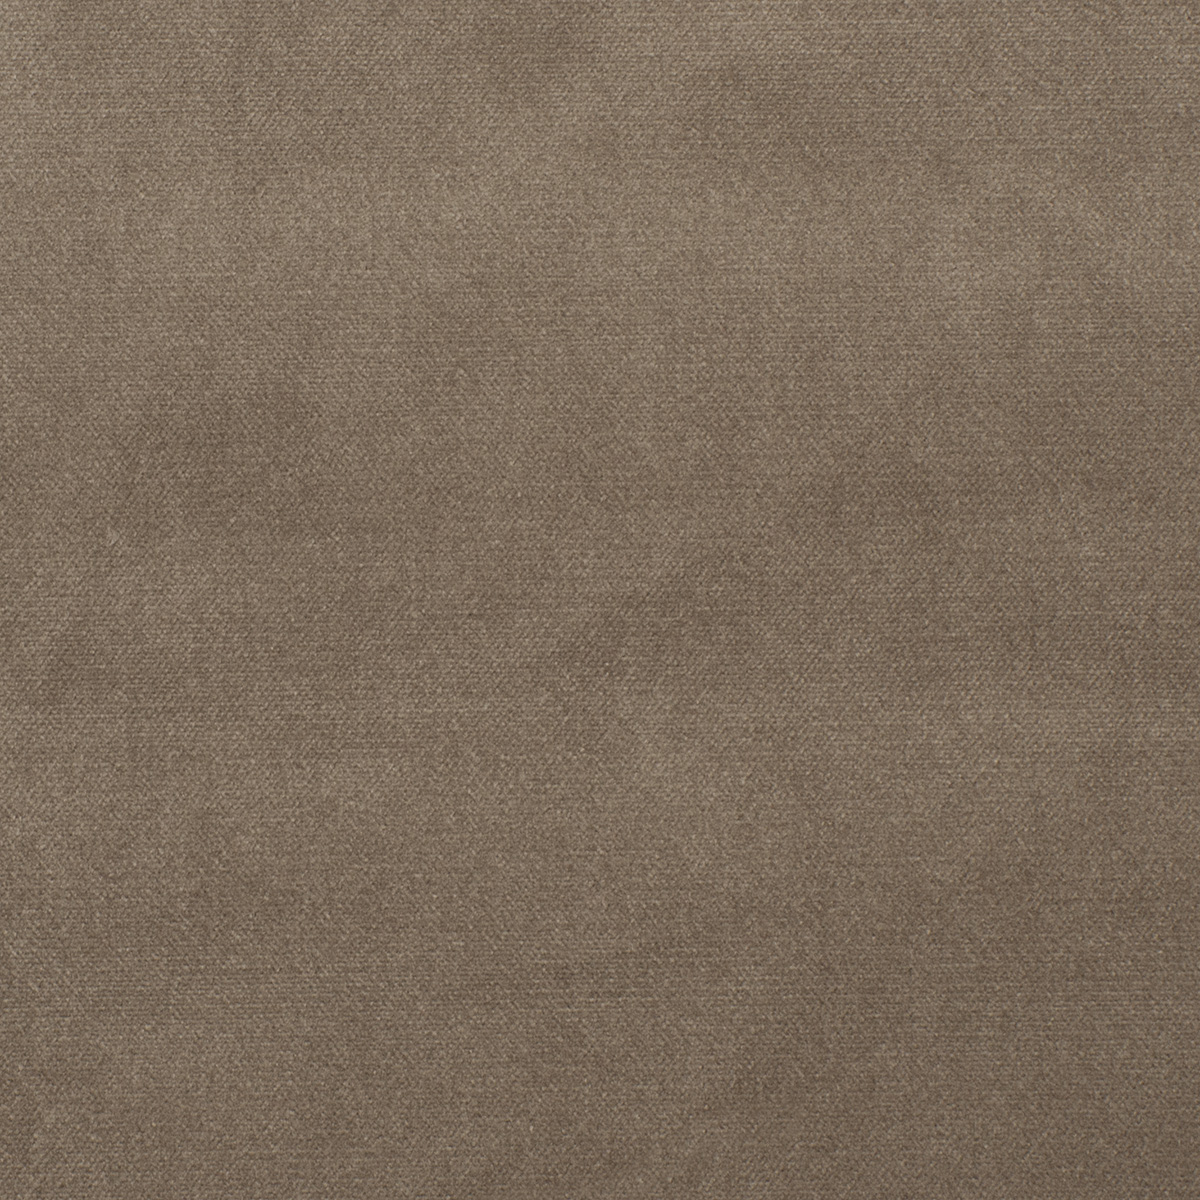 cbc0a7f849 Panache Velvet Stone | Fabric | Fabricut Contract